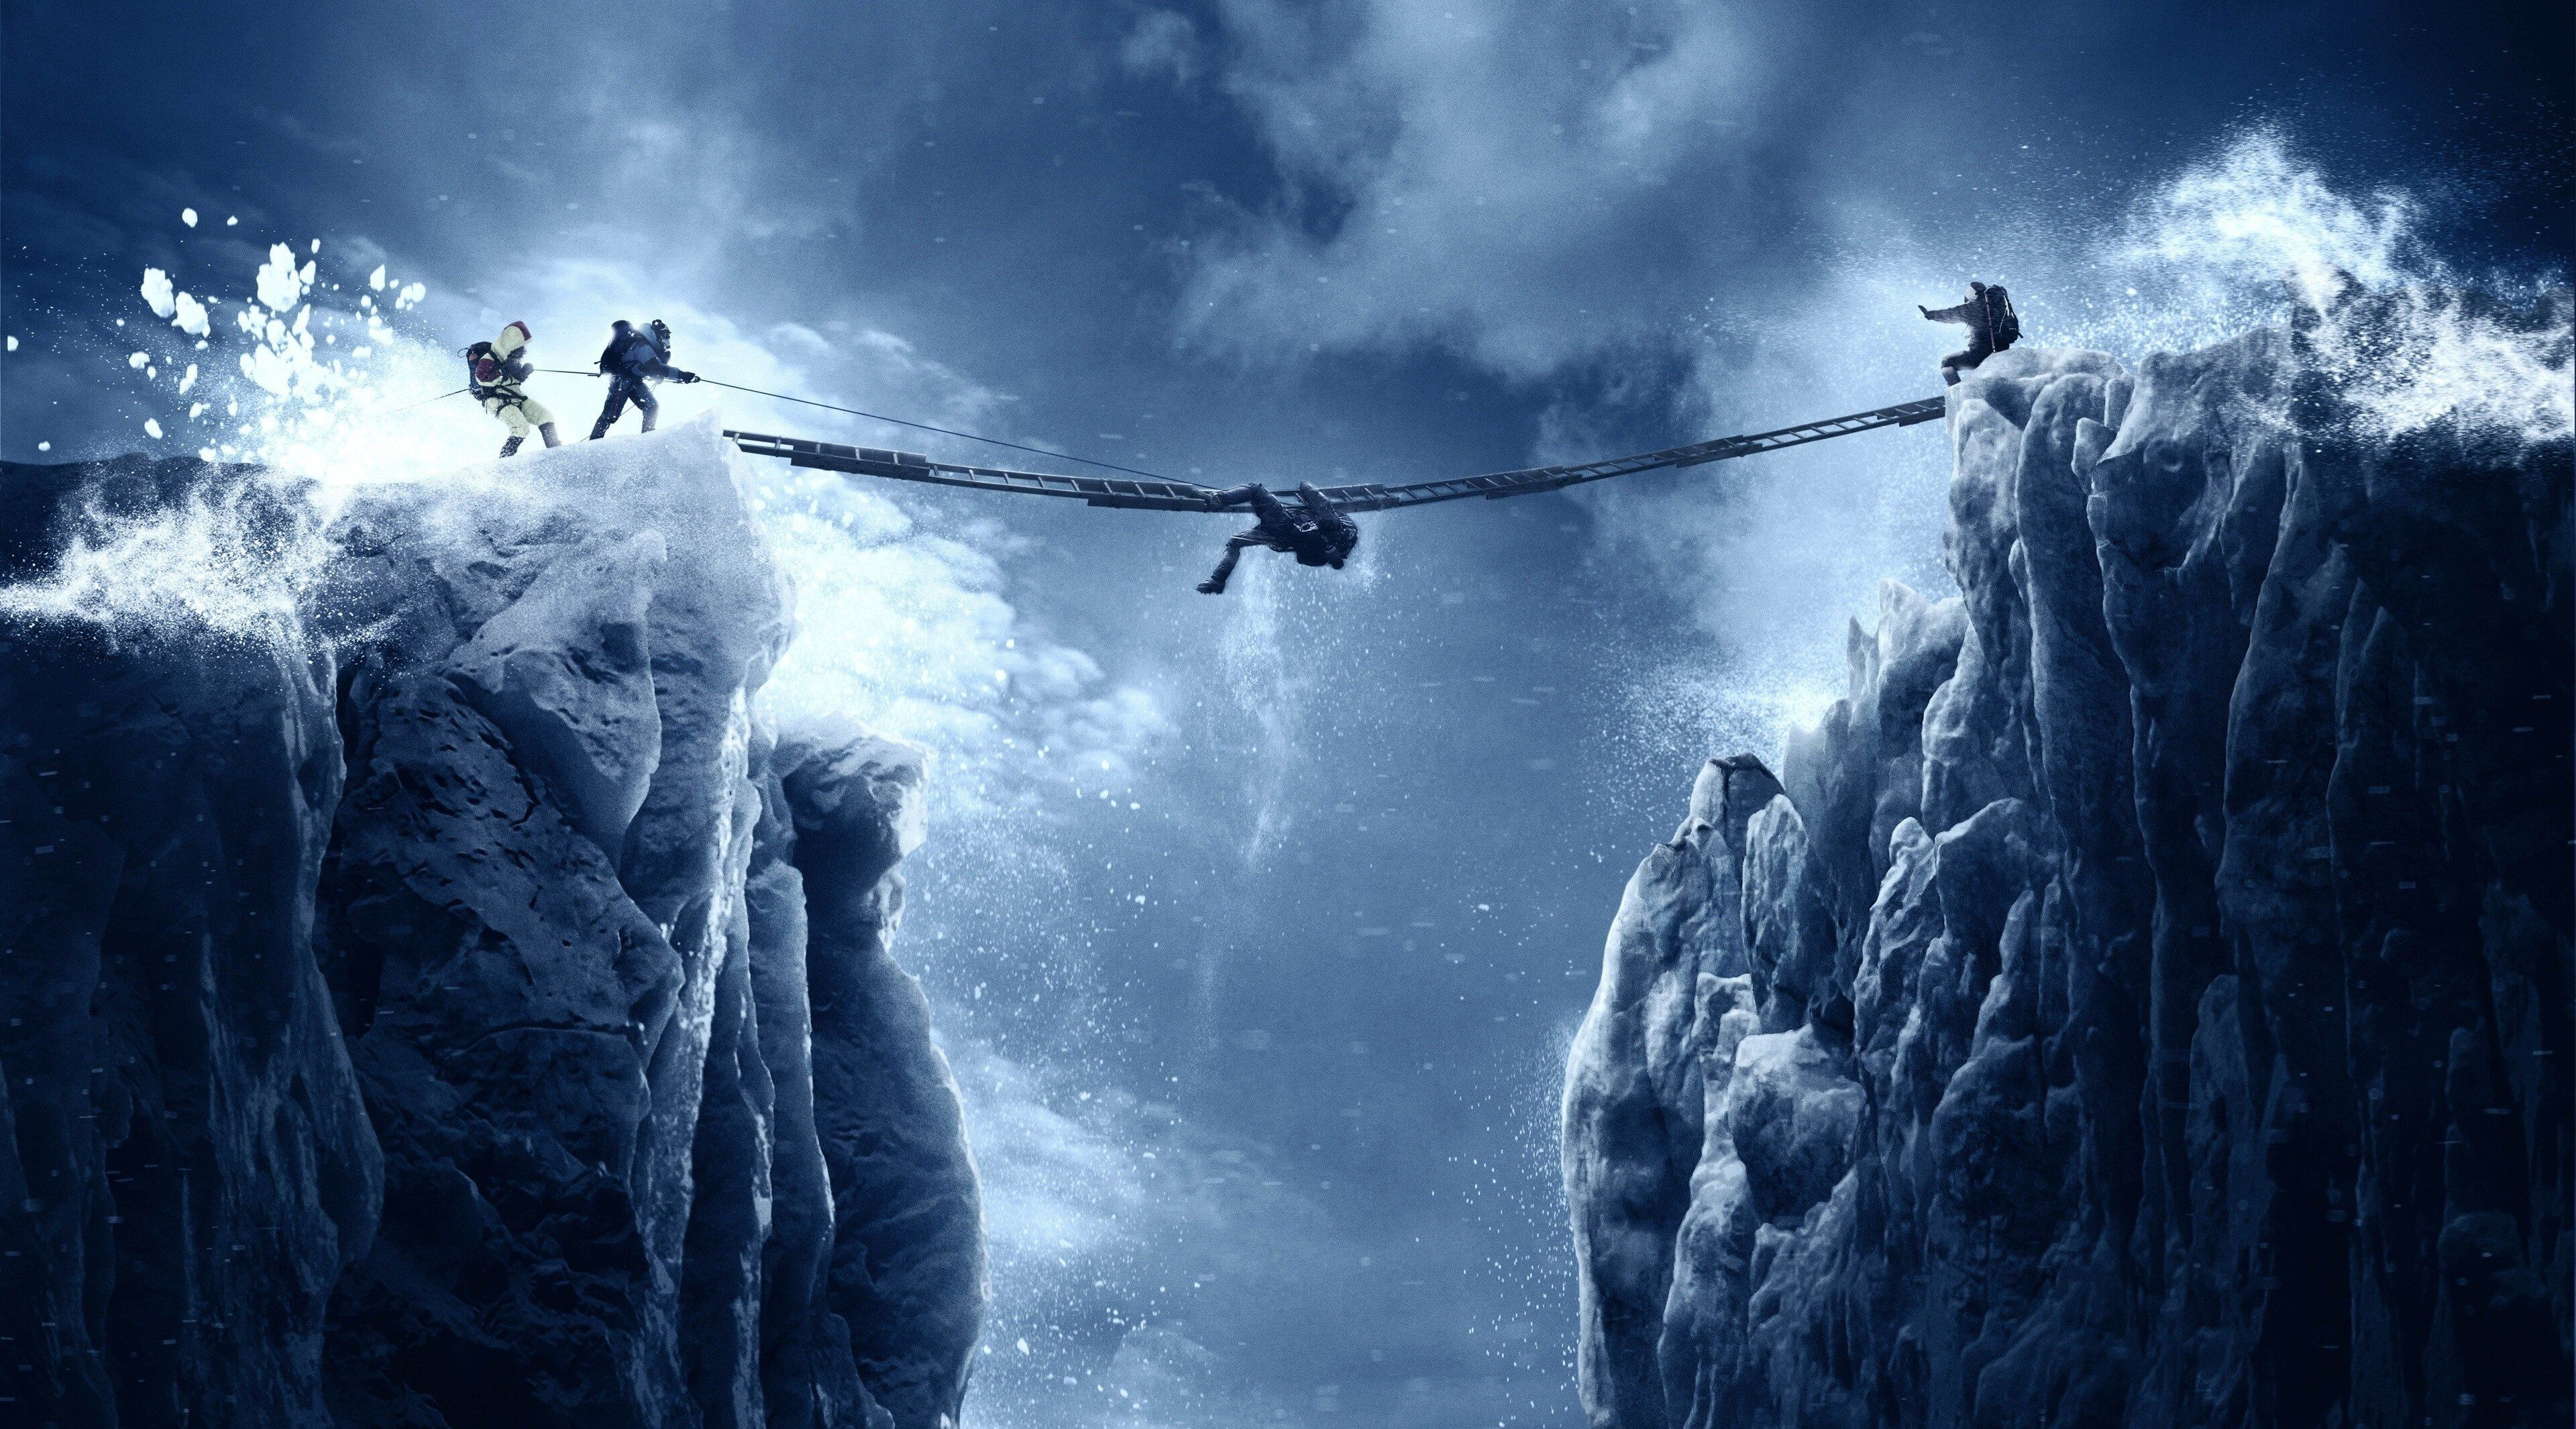 3840x2130 Everest 4k Hd Computer Wallpaper Widescreen Jason Clarke Jake Gyllenhaal Robin Wright